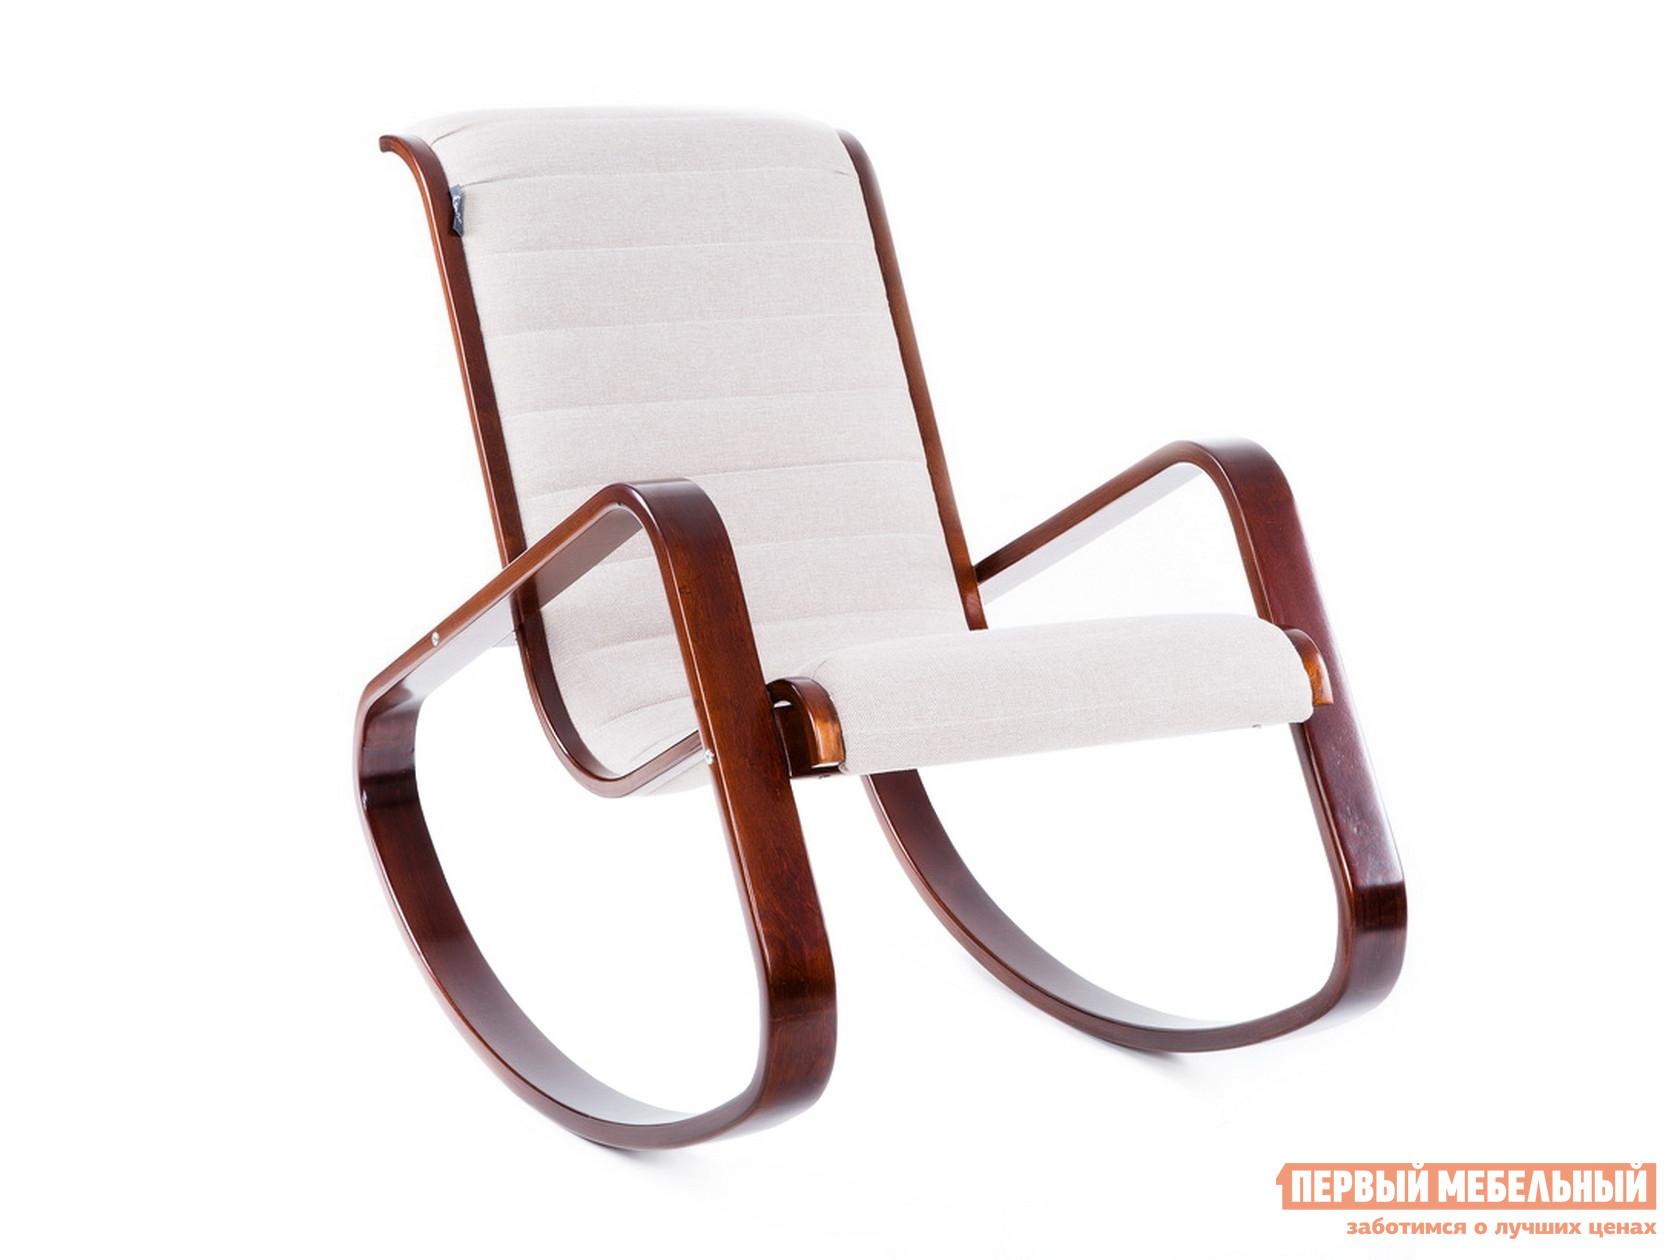 Кресло-качалка Грин Три Кресло-качалка АРНО